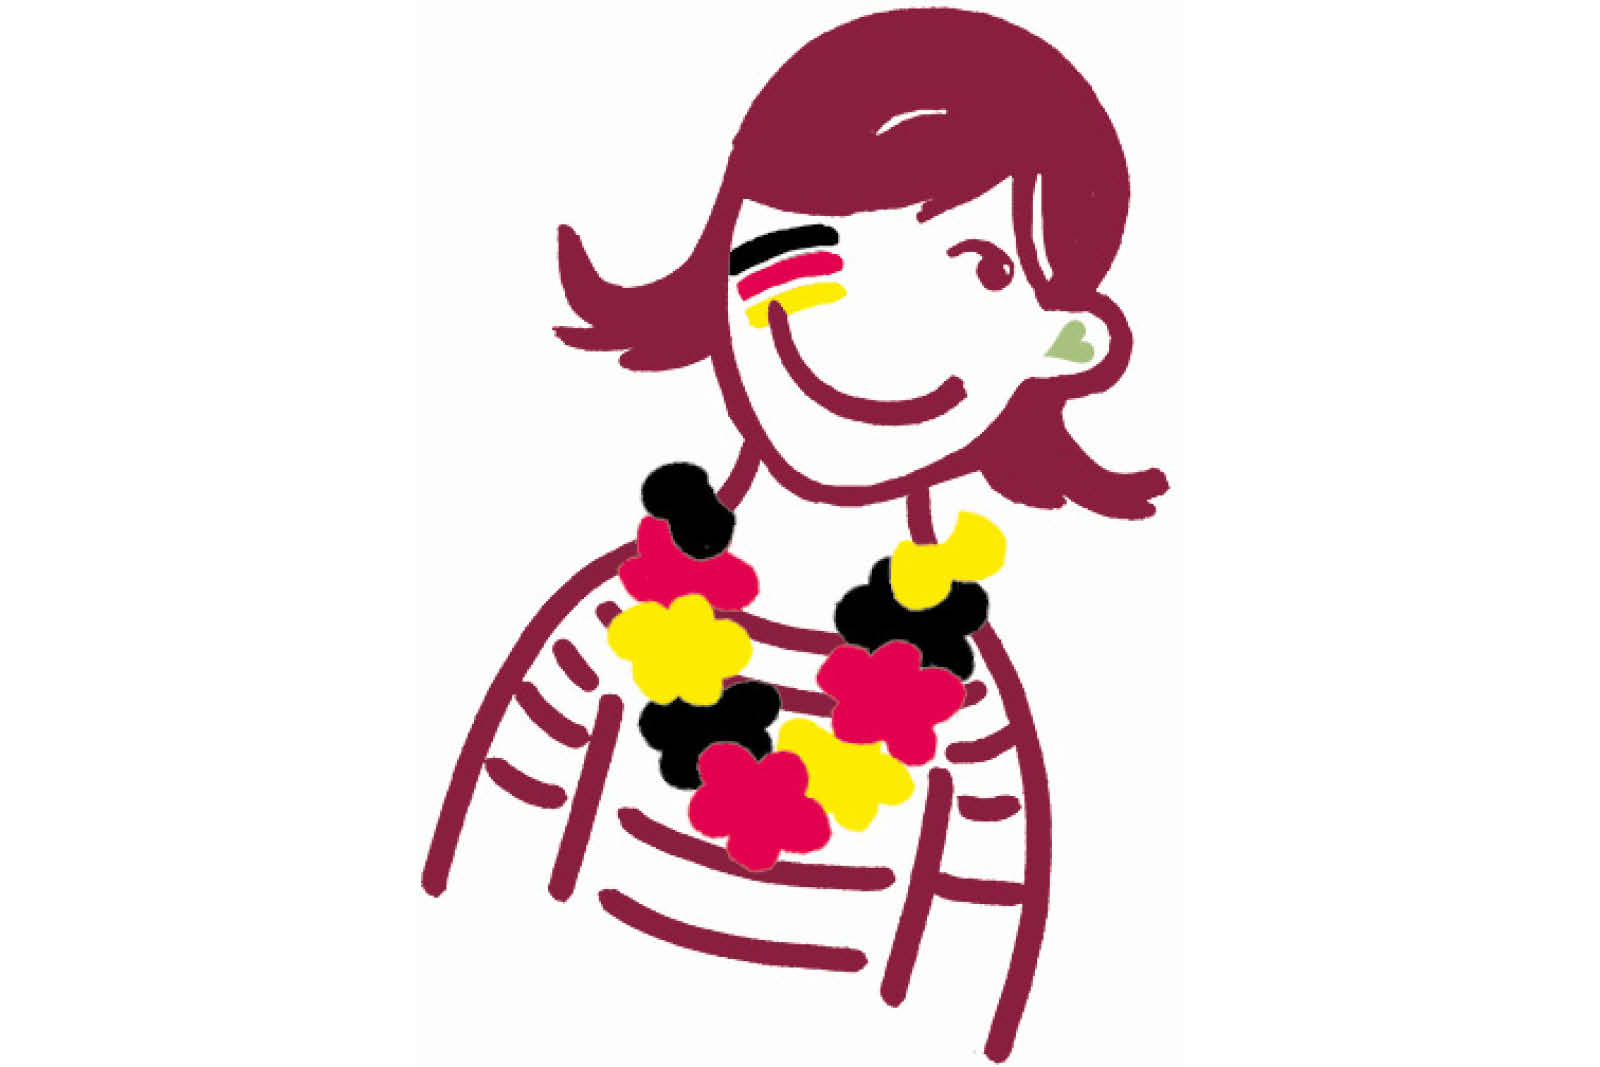 sympathiefigur-illustration-hoerakustik-winkelmann-07.jpg